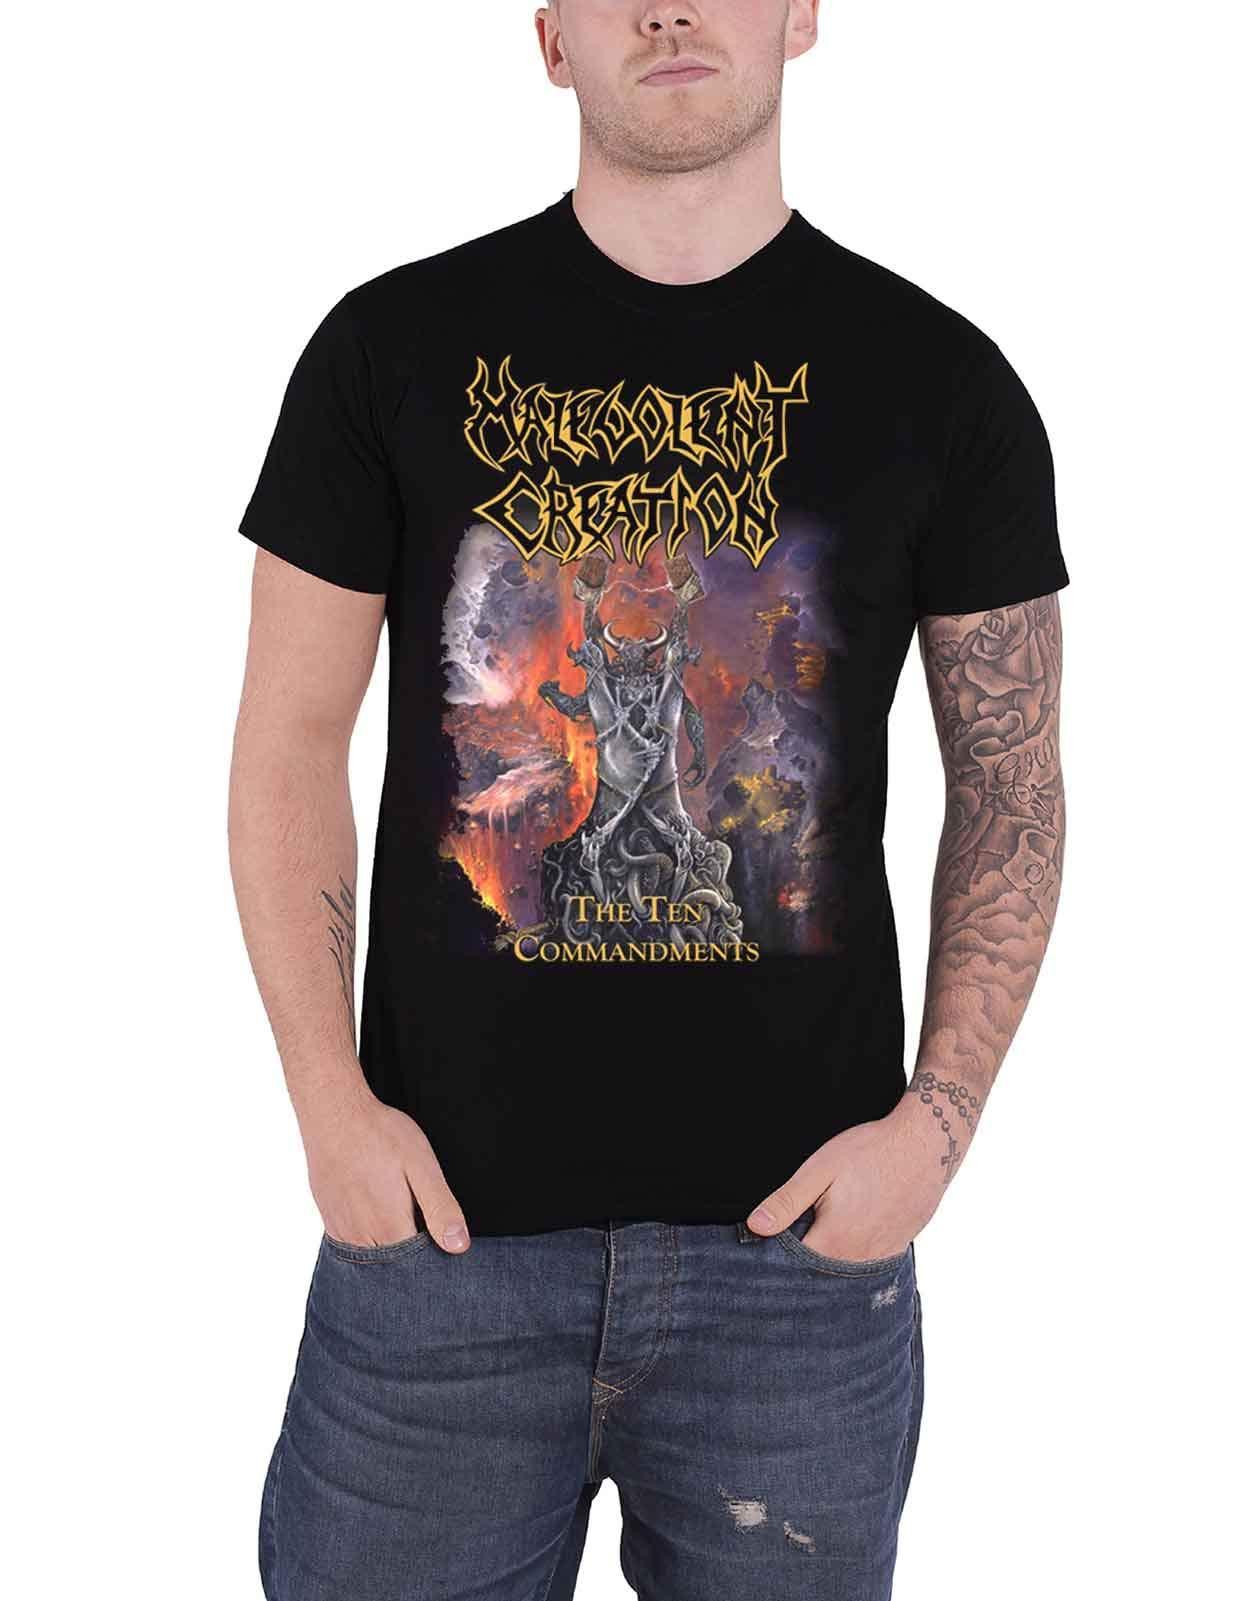 Malevolent Creation T Shirt The Ten Commandts Band Logo S Black